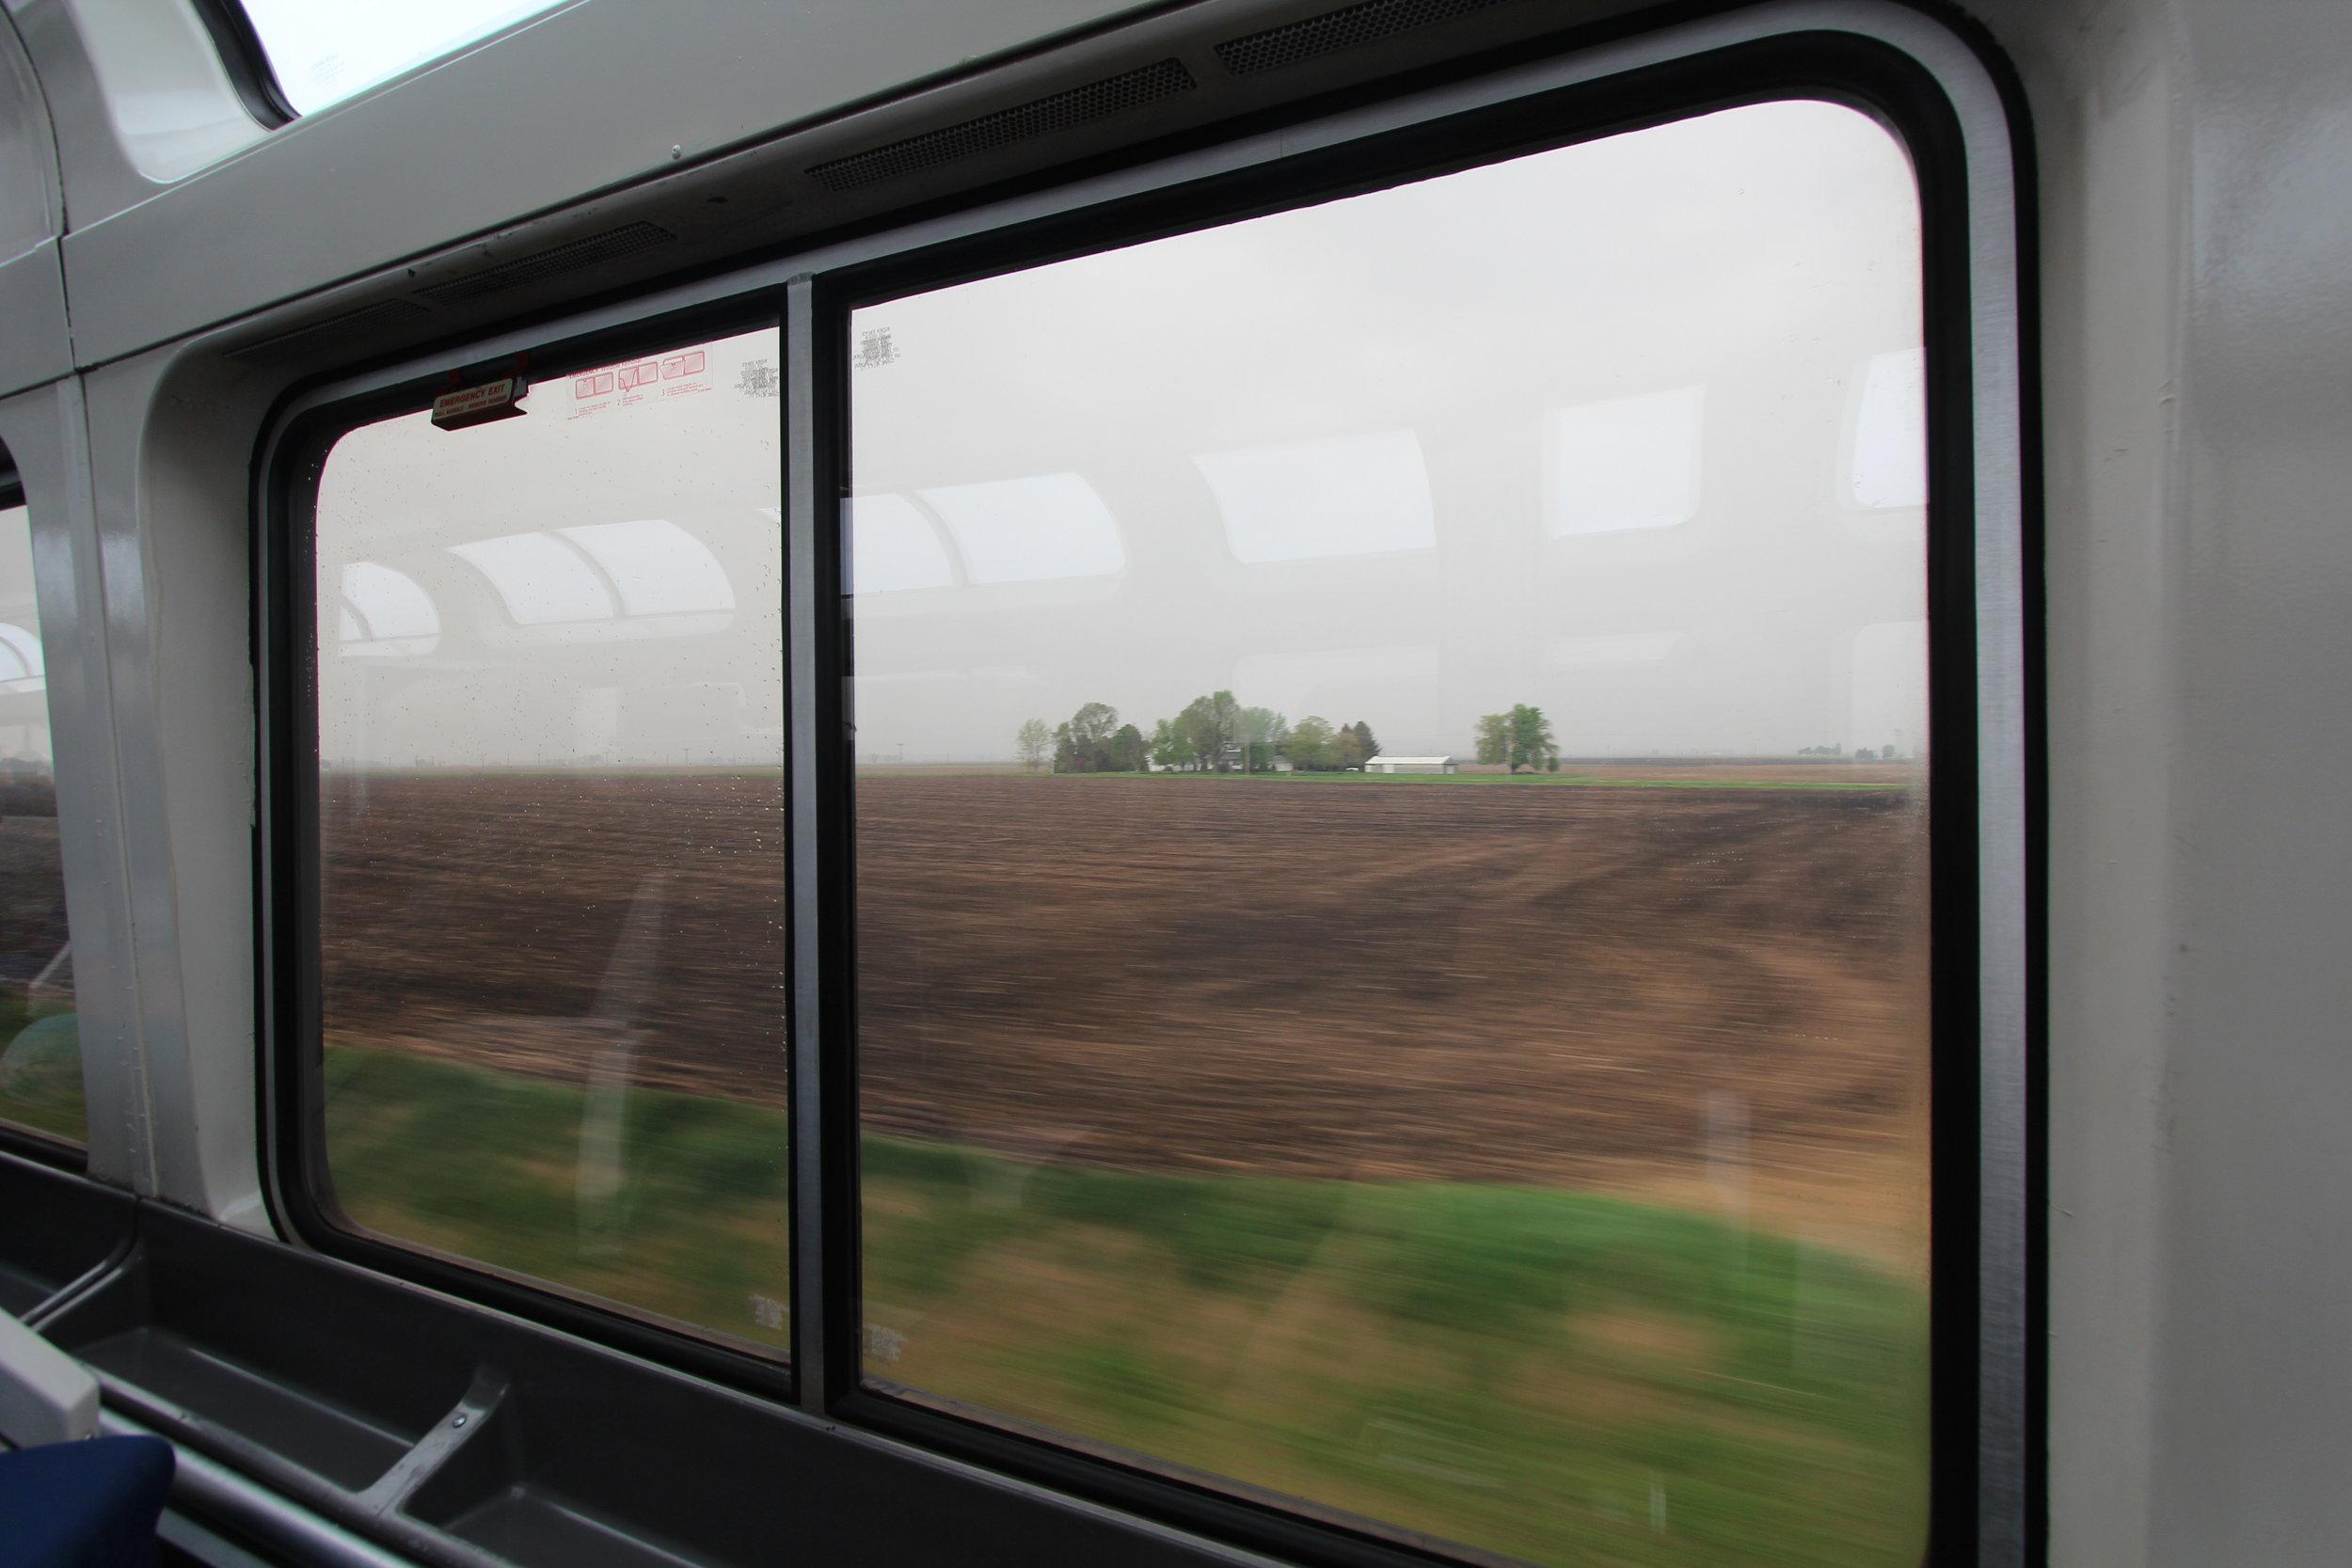 Illinois Plains on Southwest Chief